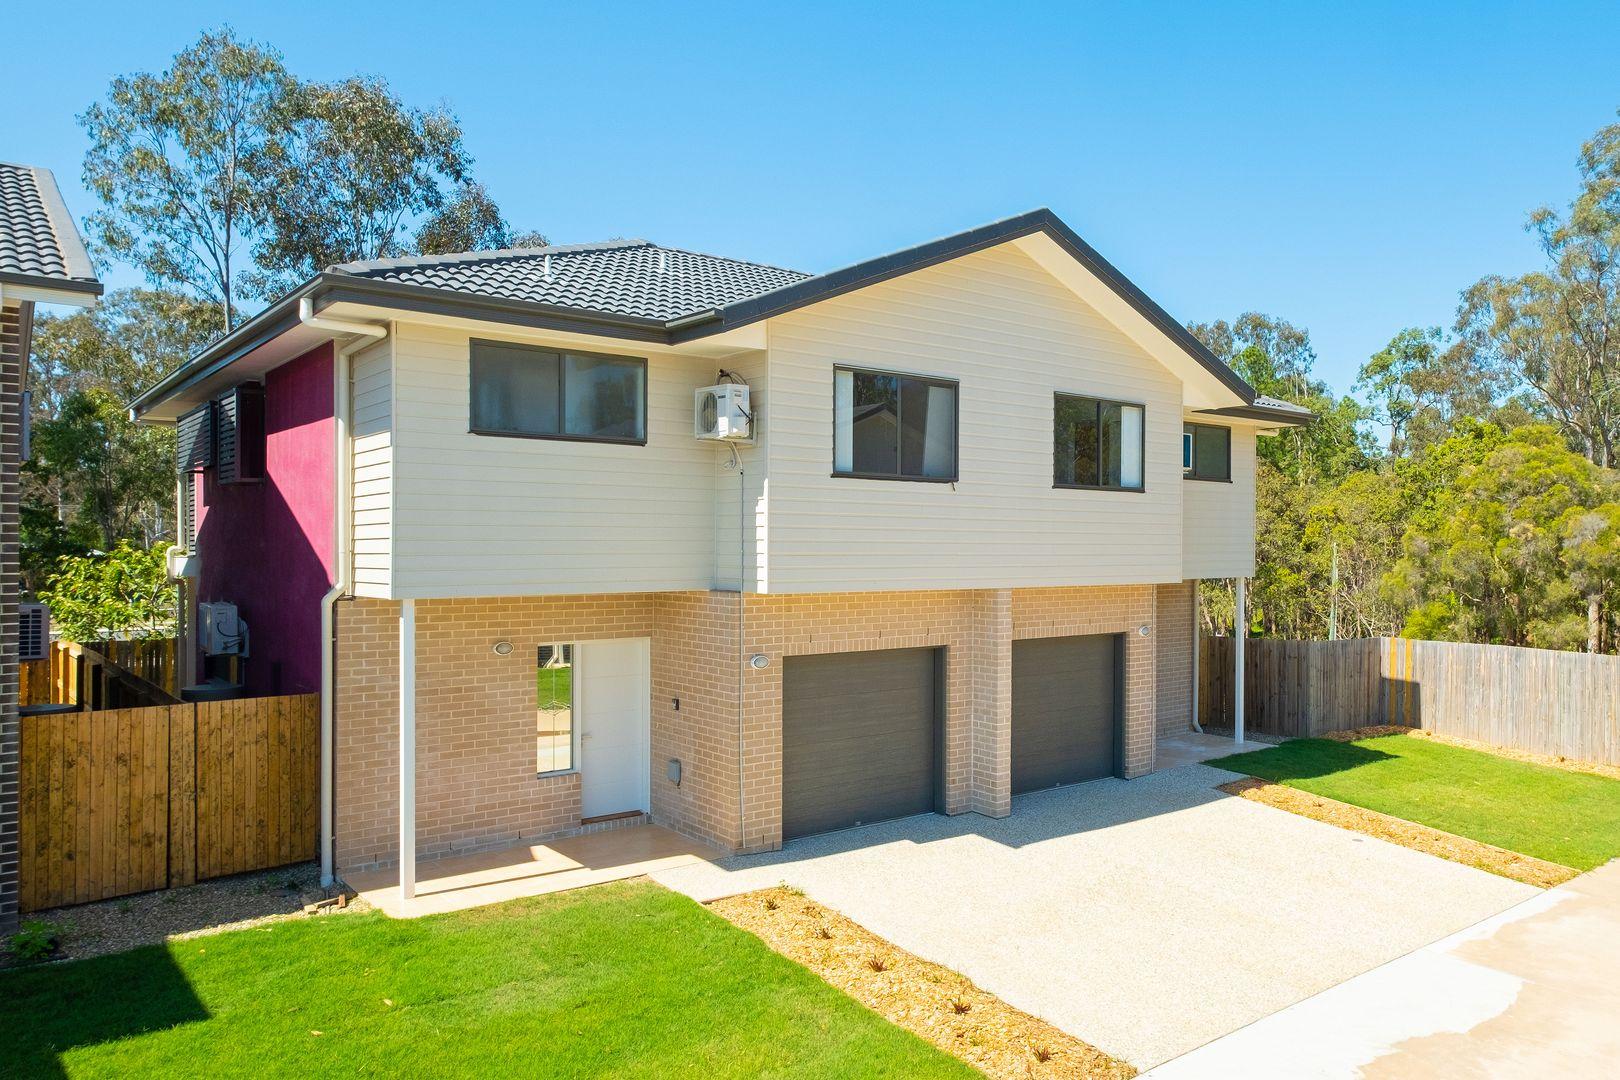 257 Chambers Flat Road, Crestmead QLD 4132, Image 0